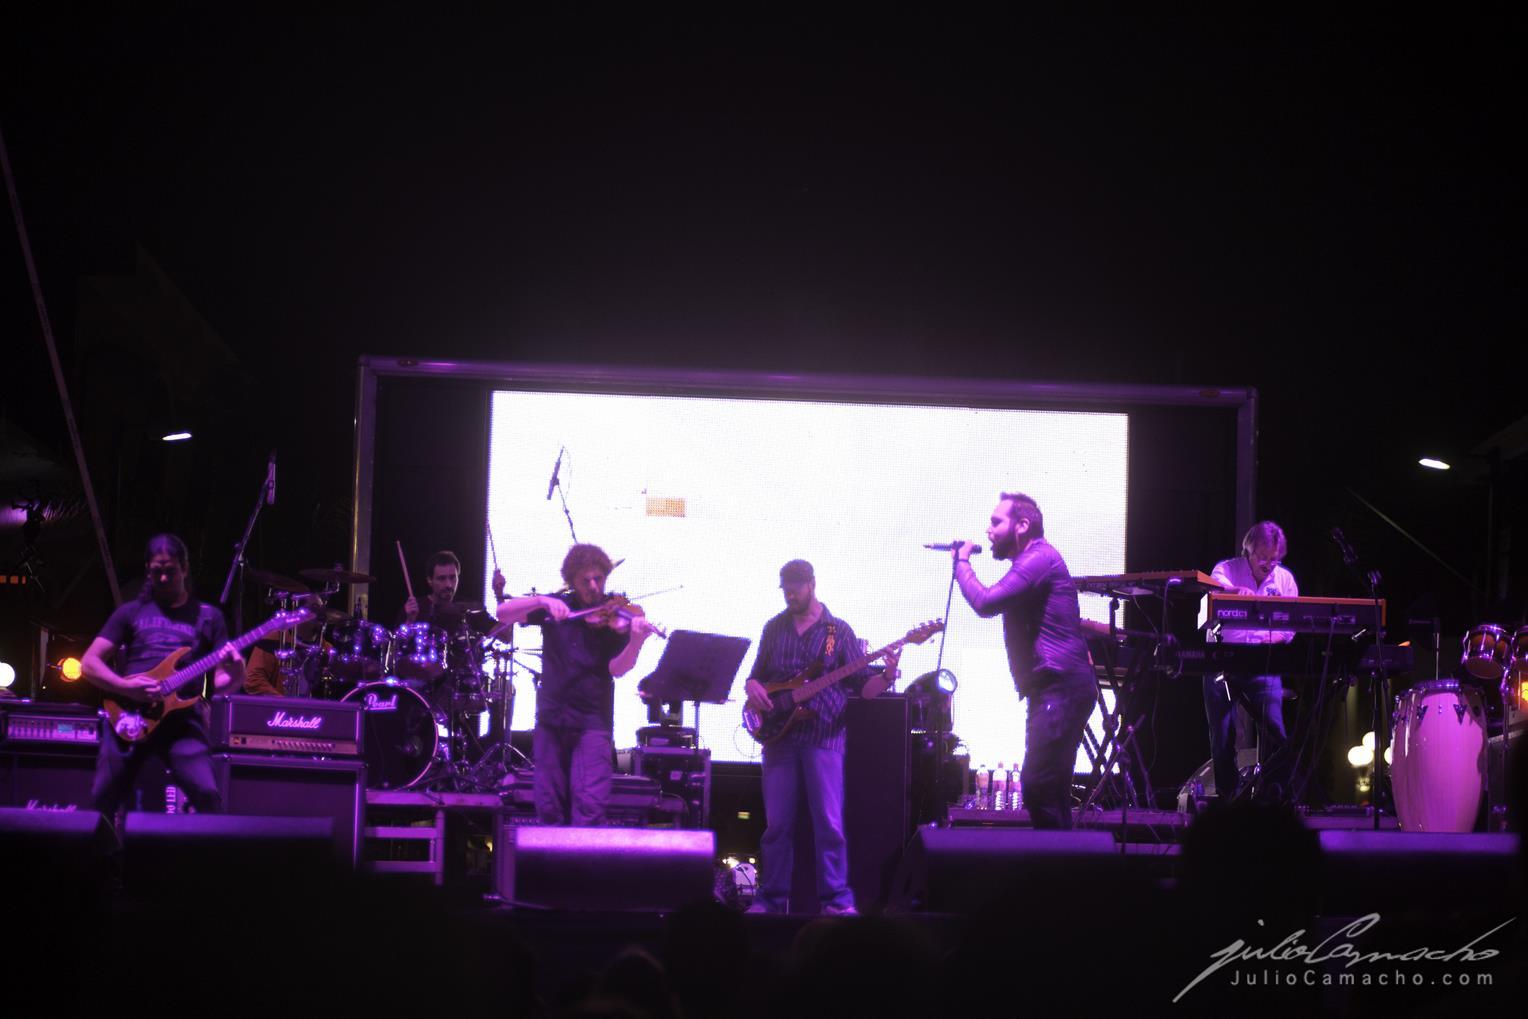 2014-10-30 31 CAST TOUR Ensenada y Tijuana - 1406 - www.Juli (Copy).jpg